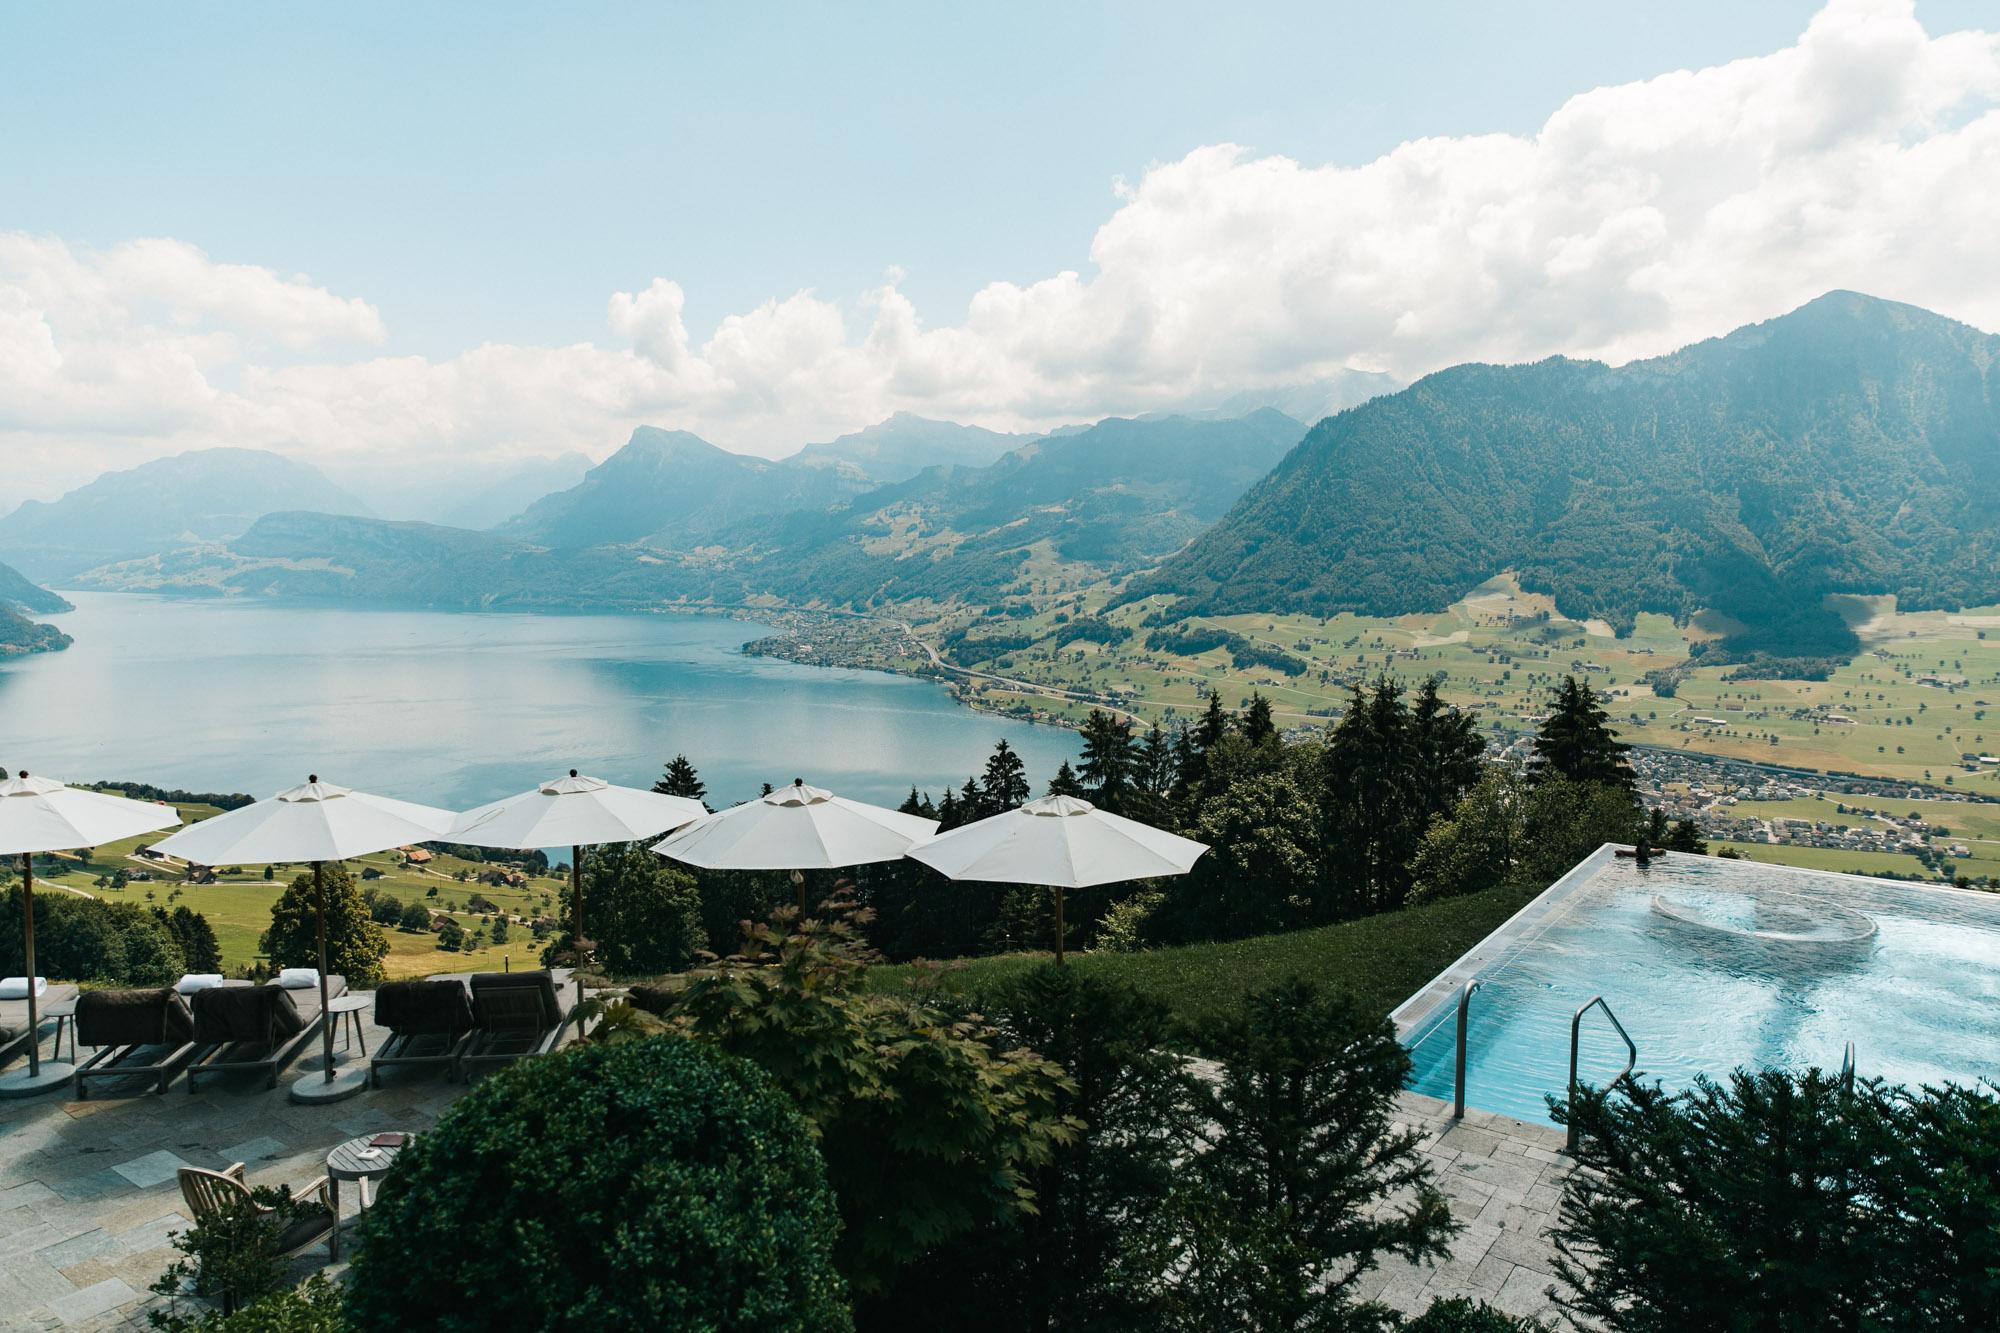 SwitzerlandBlog_HBGOODIE2018 (51 of 58).jpg